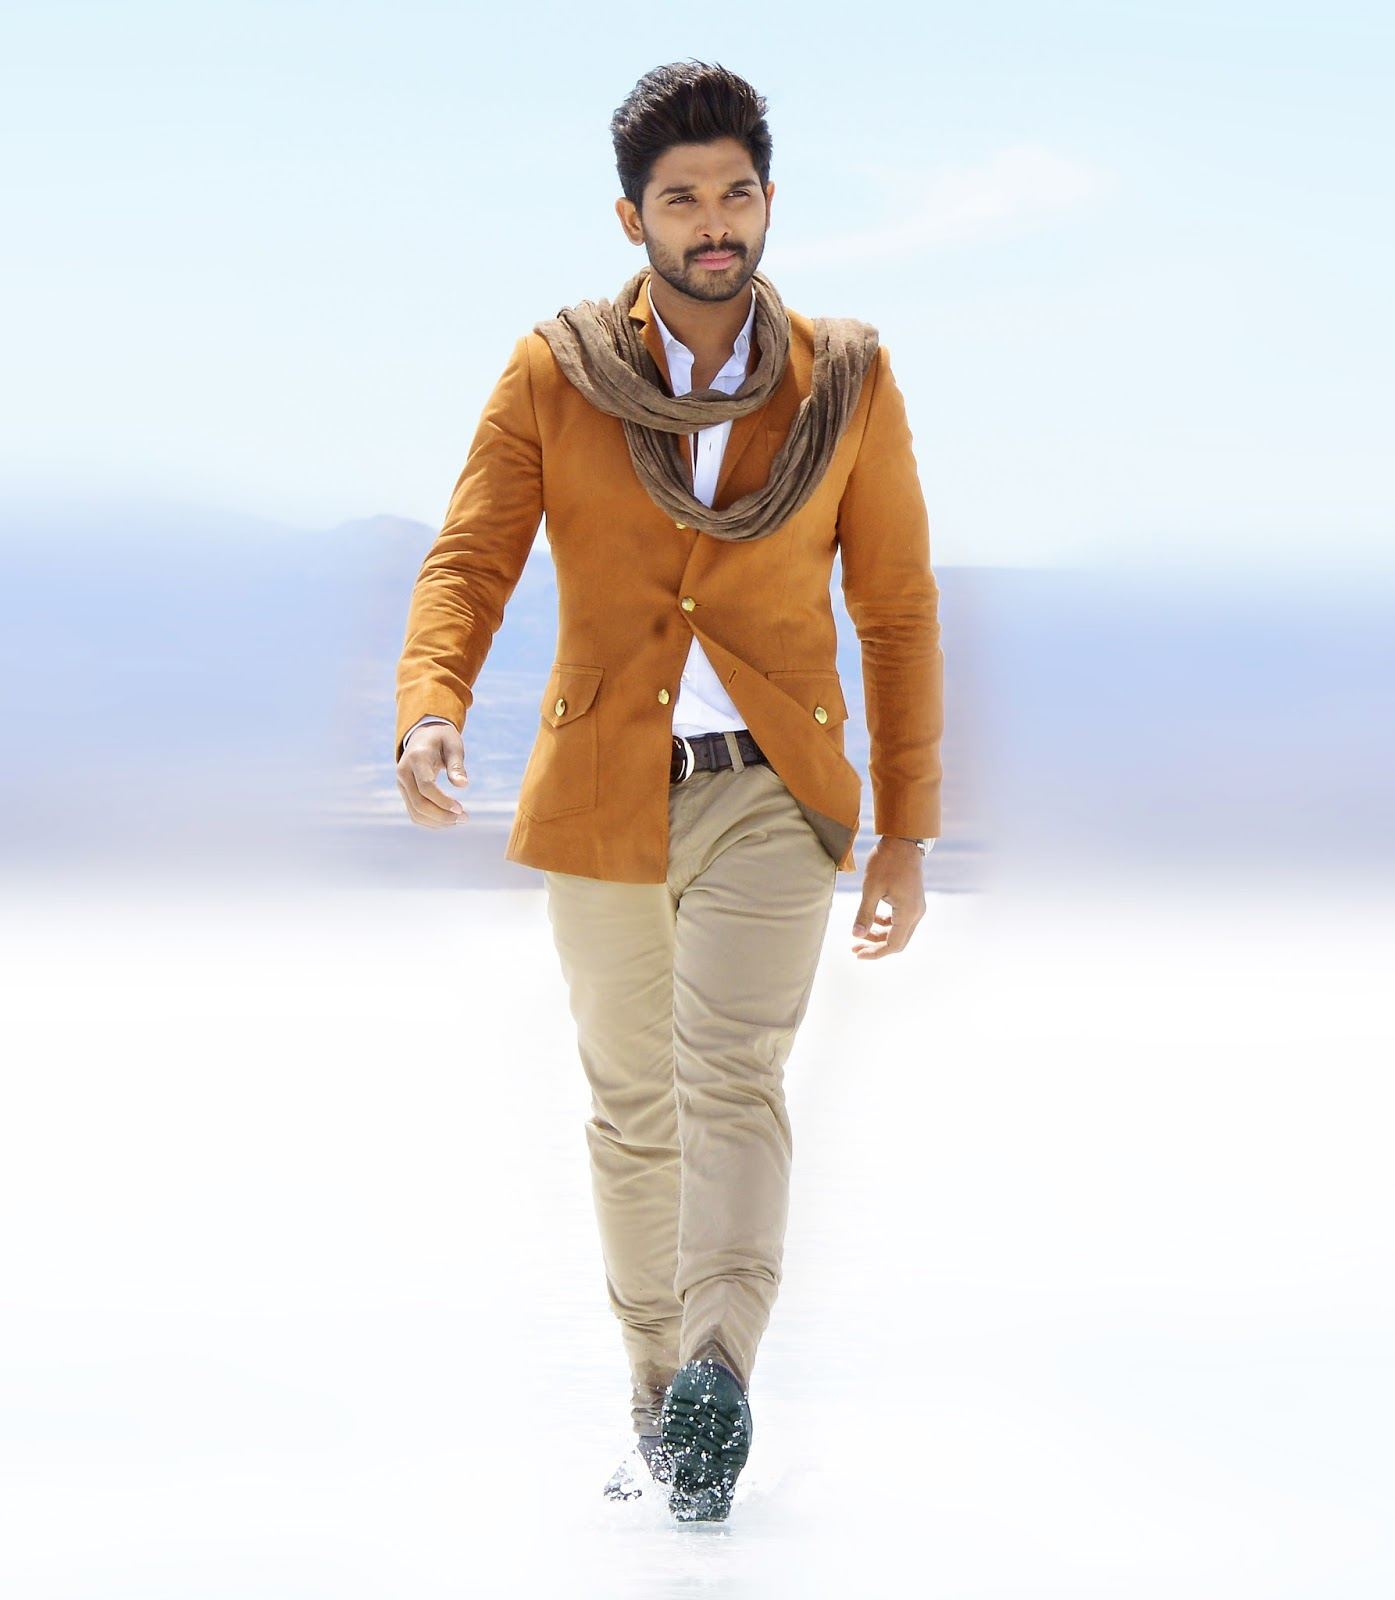 allu arjun stylish stills in sarrainodu movie